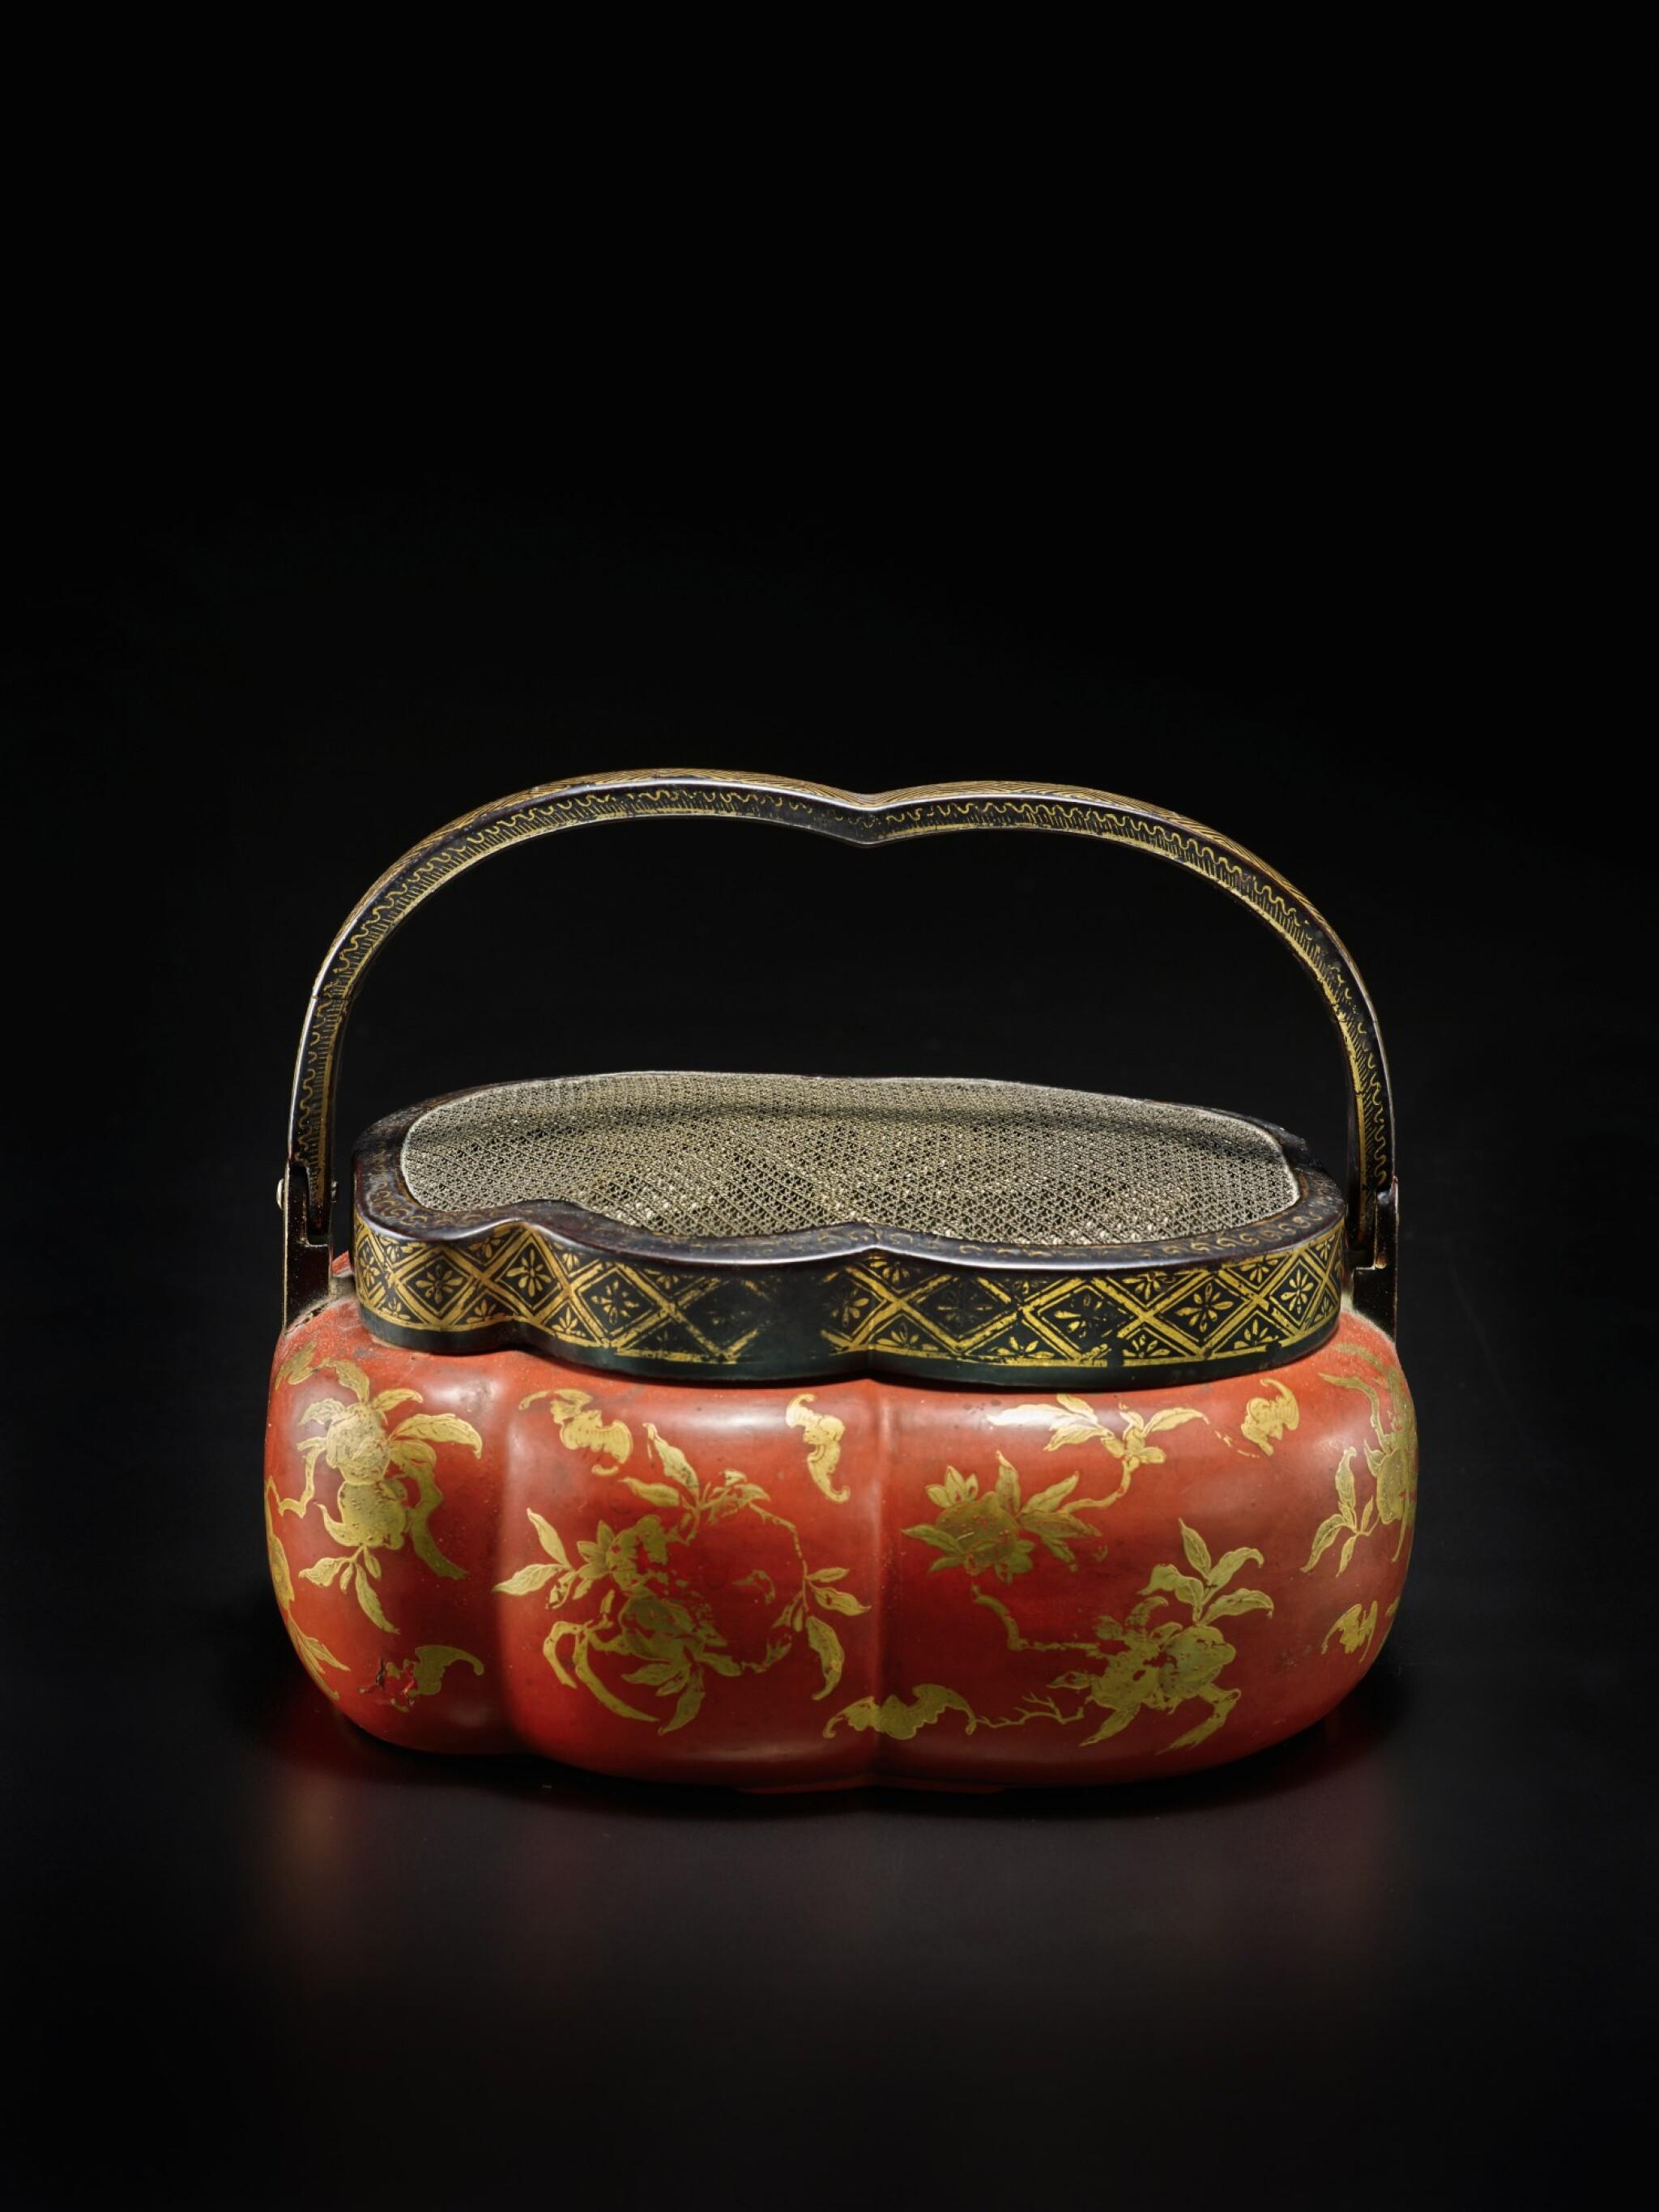 View full screen - View 1 of Lot 220. A rare red and gilt-lacquer handwarmer, Qing dynasty, 18th / 19th century | 清十八 / 十九世紀 朱漆描金福壽雙全紋手爐.